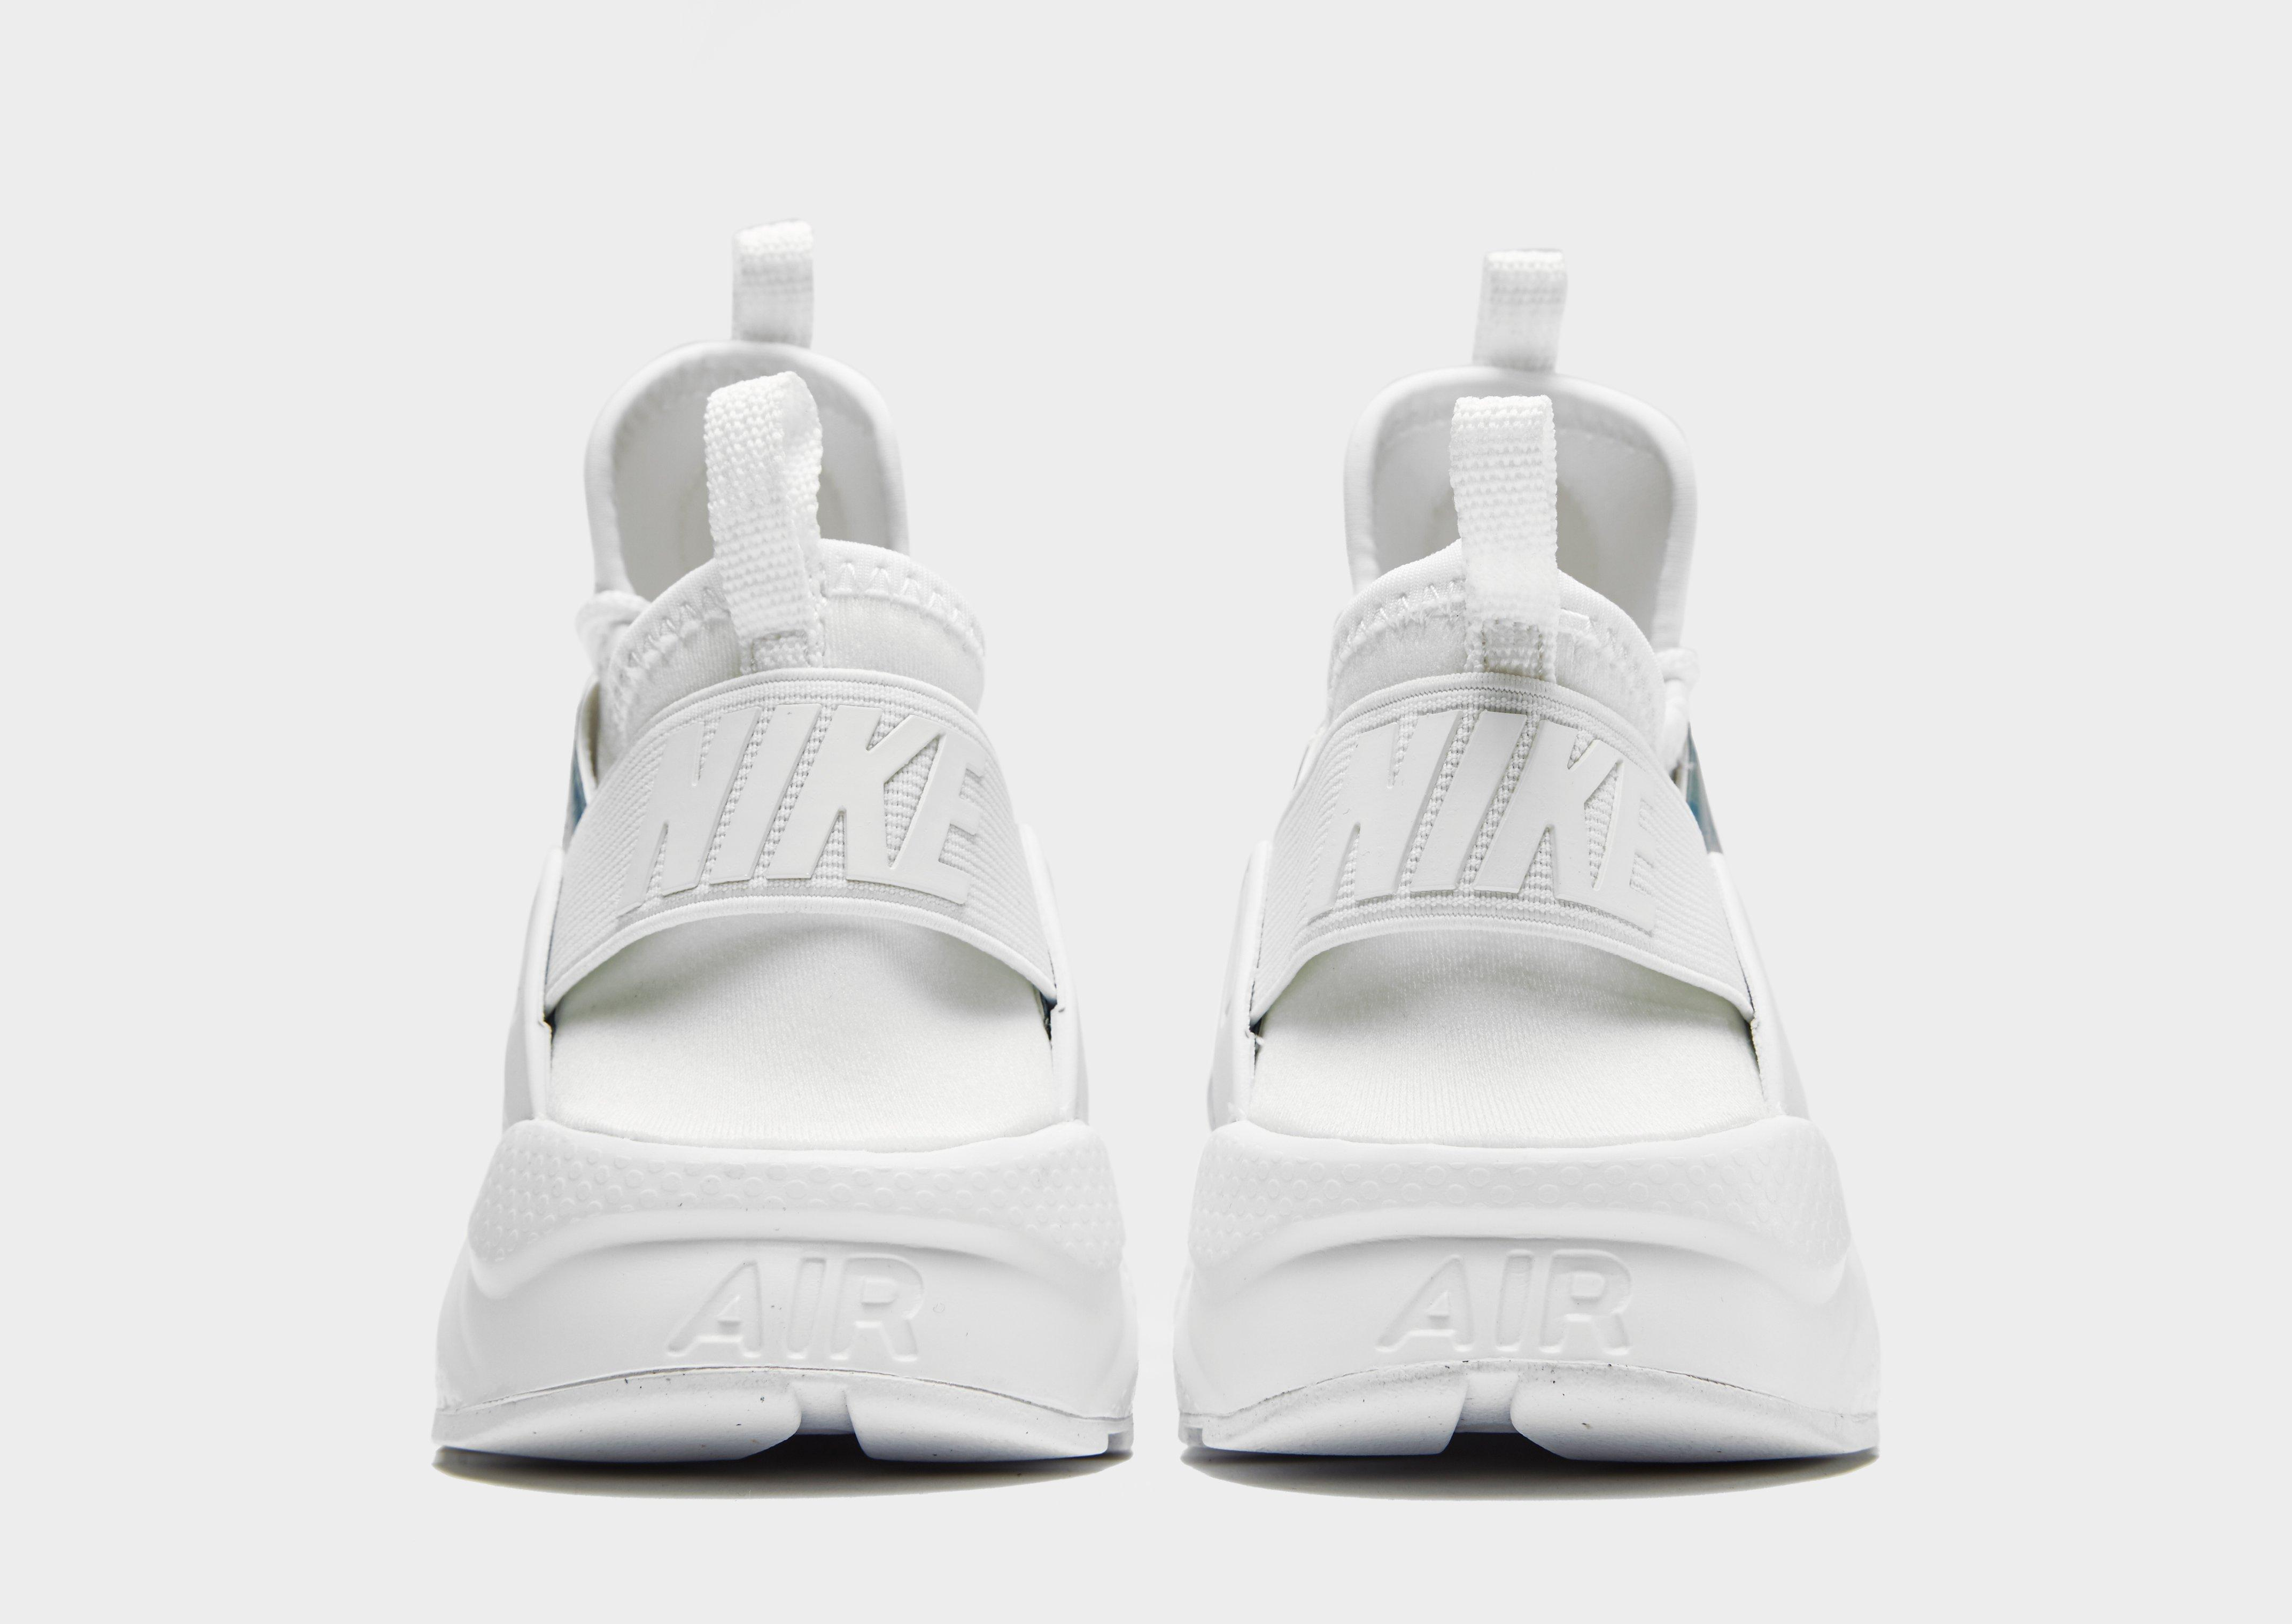 8725cf06b1d8 Black Nike Air Presto Online